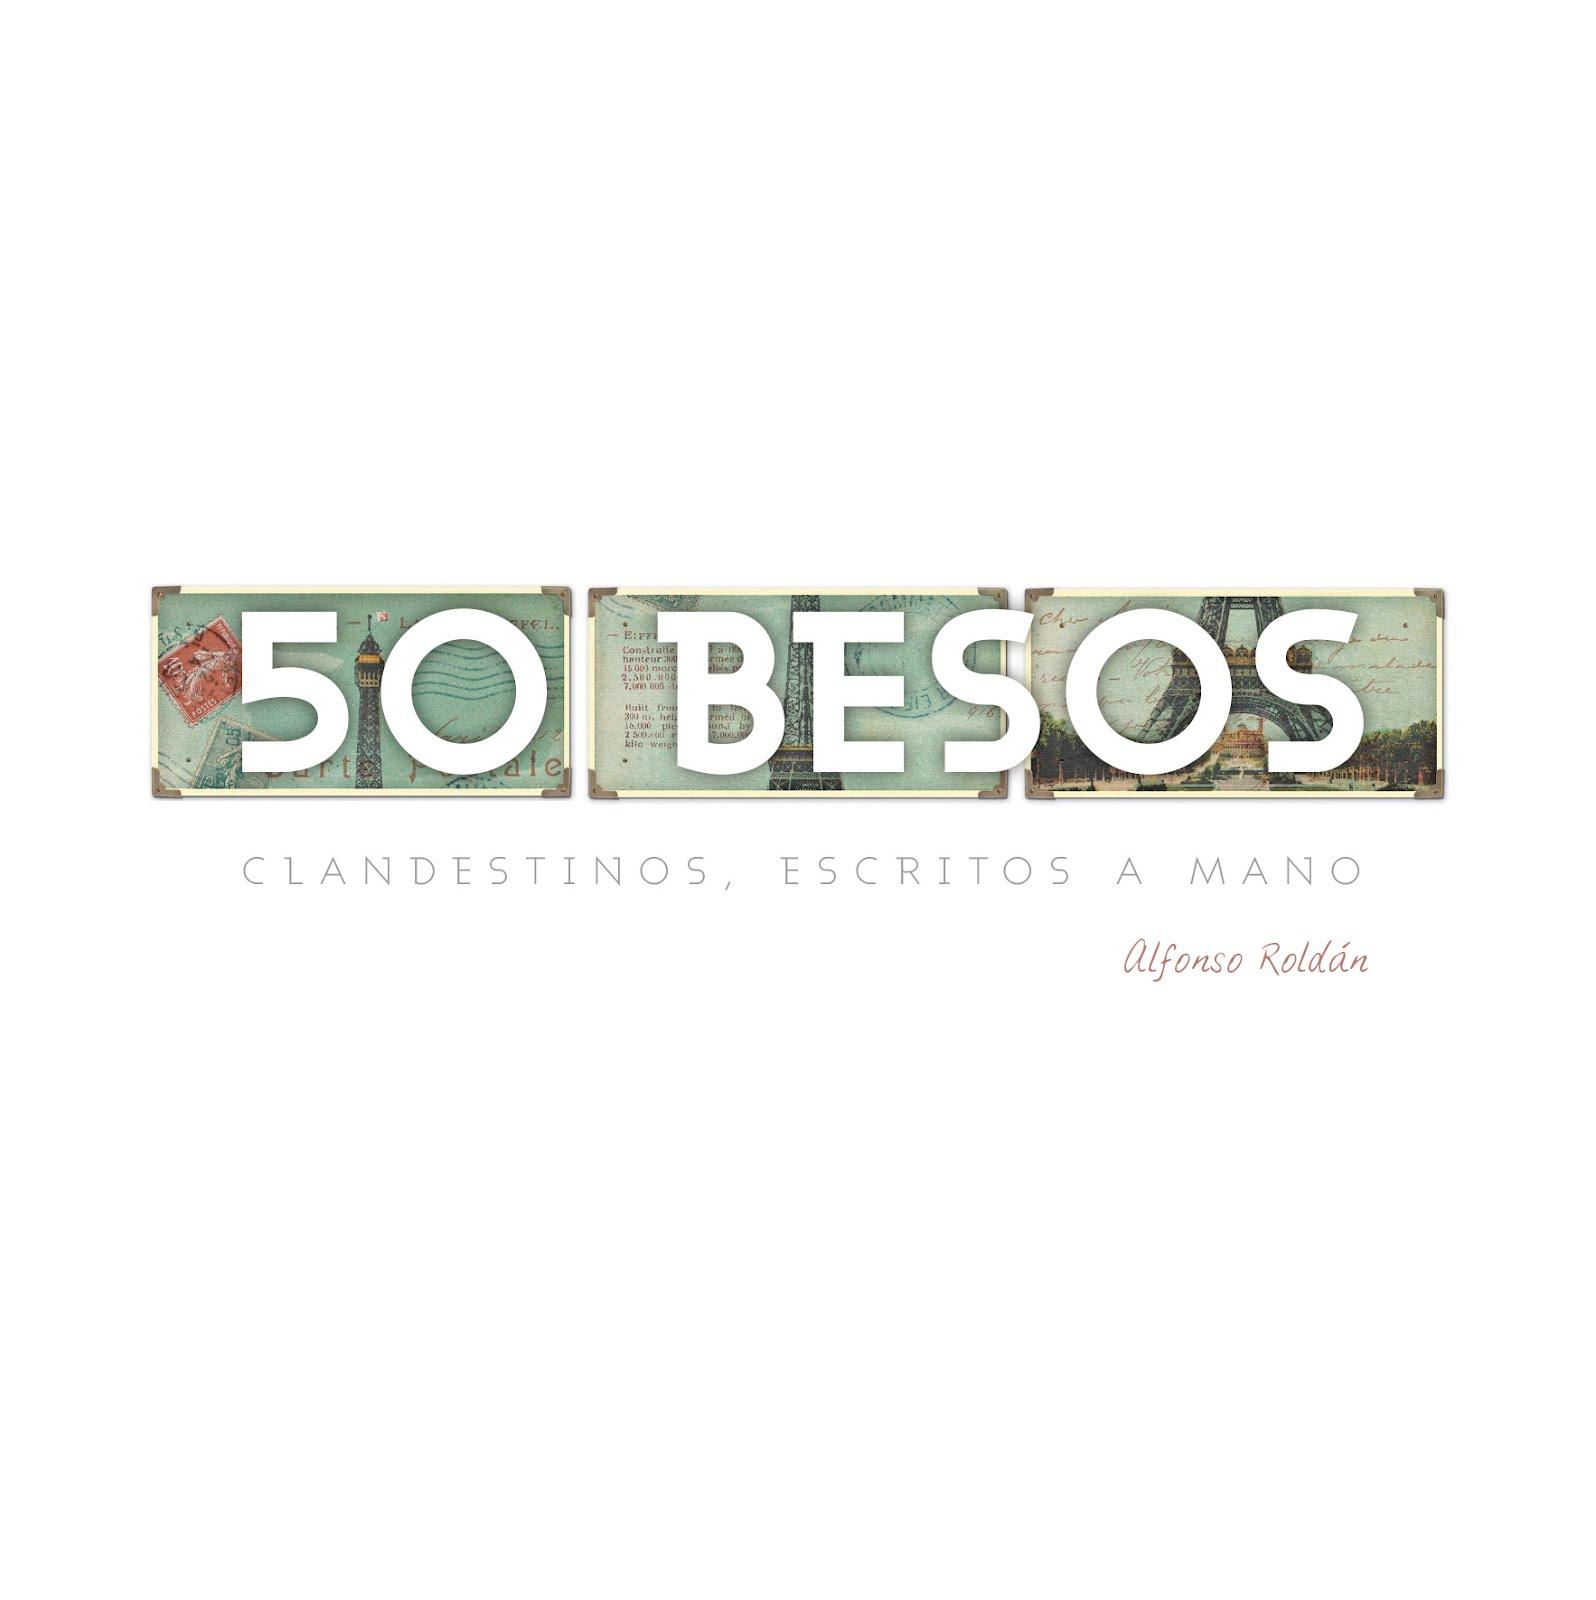 50 besos